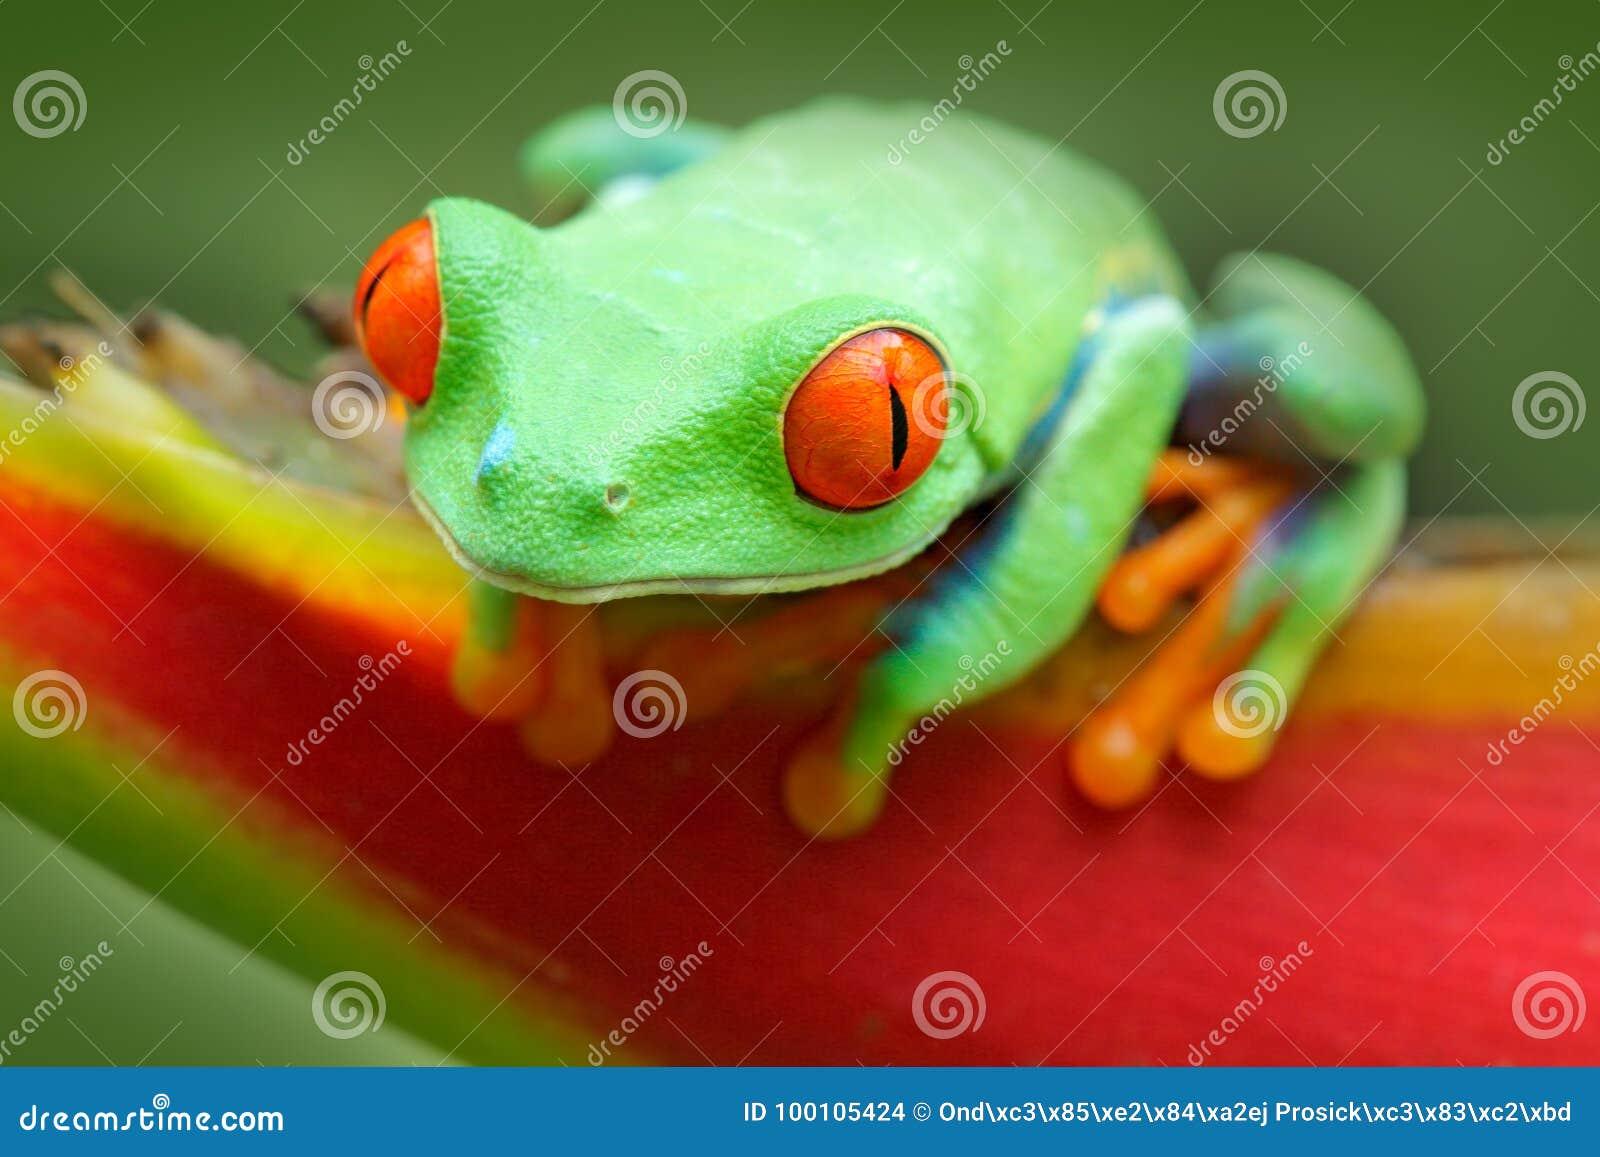 Grenouille Costa Rica grenouille de costa rica belle grenouille dans la forêt, animal